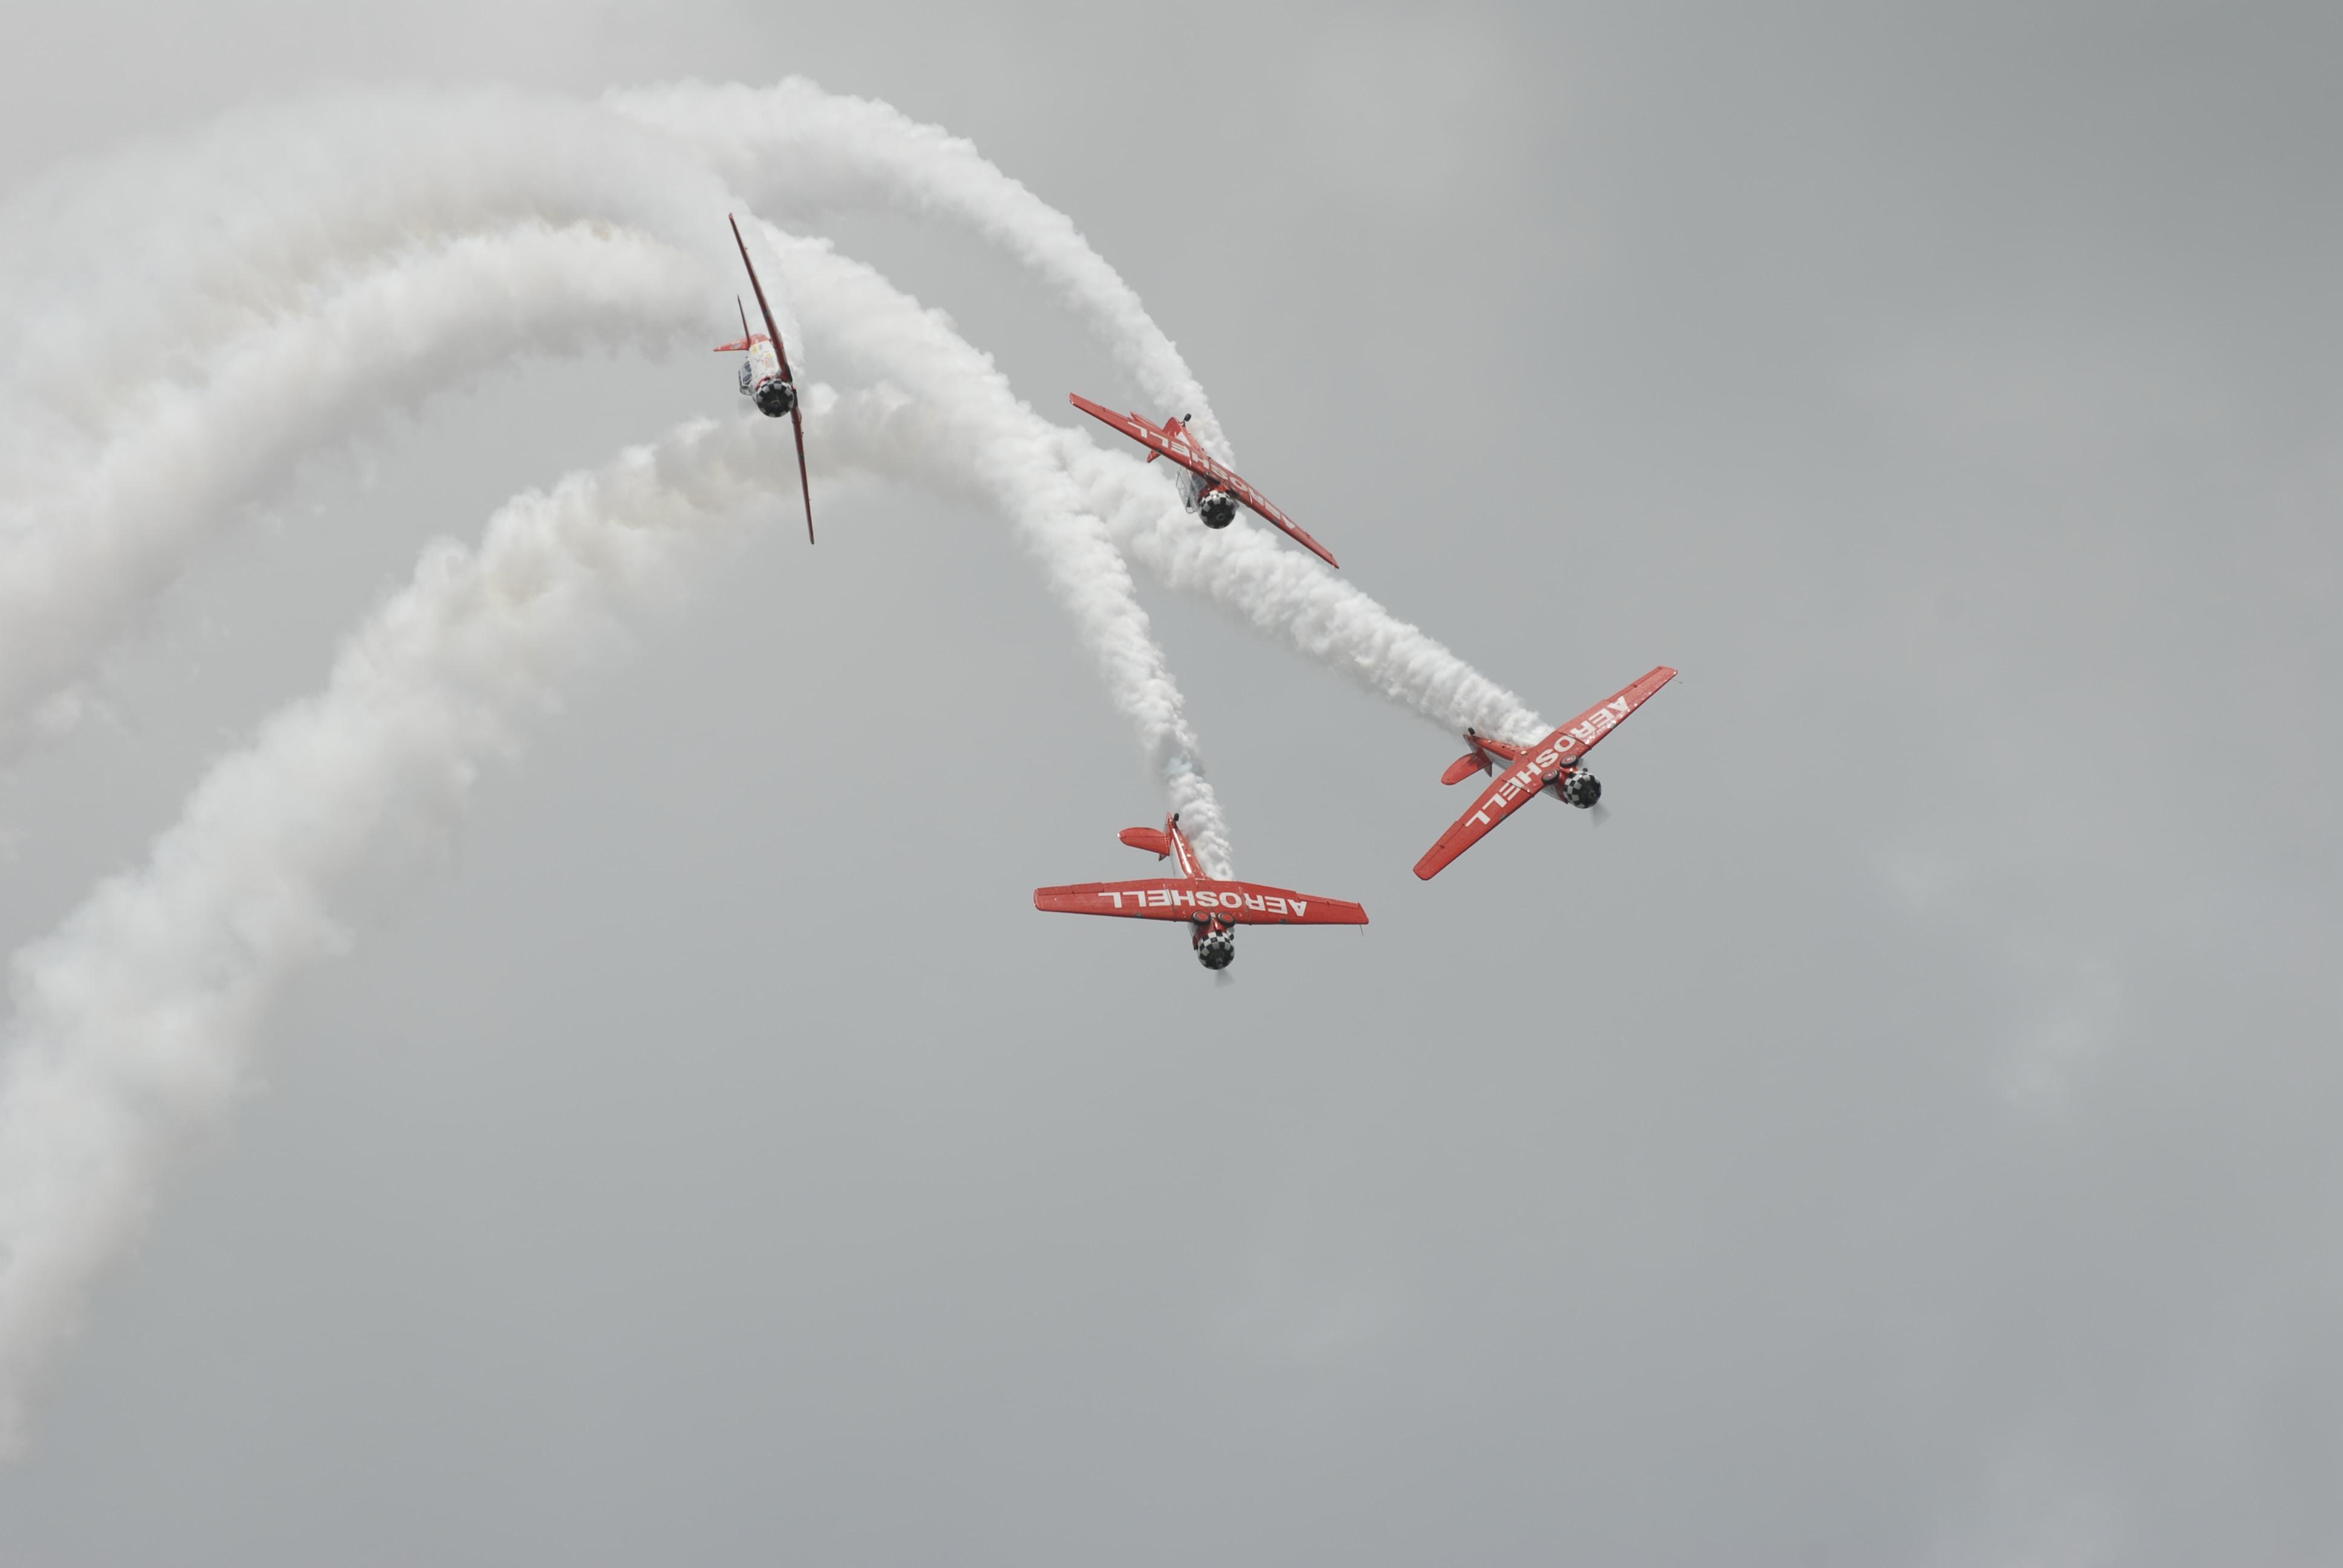 Beschreibung des Fotografen: The Aeroshell Aerobatic Team at Sun 'n Fun airshow in 2008